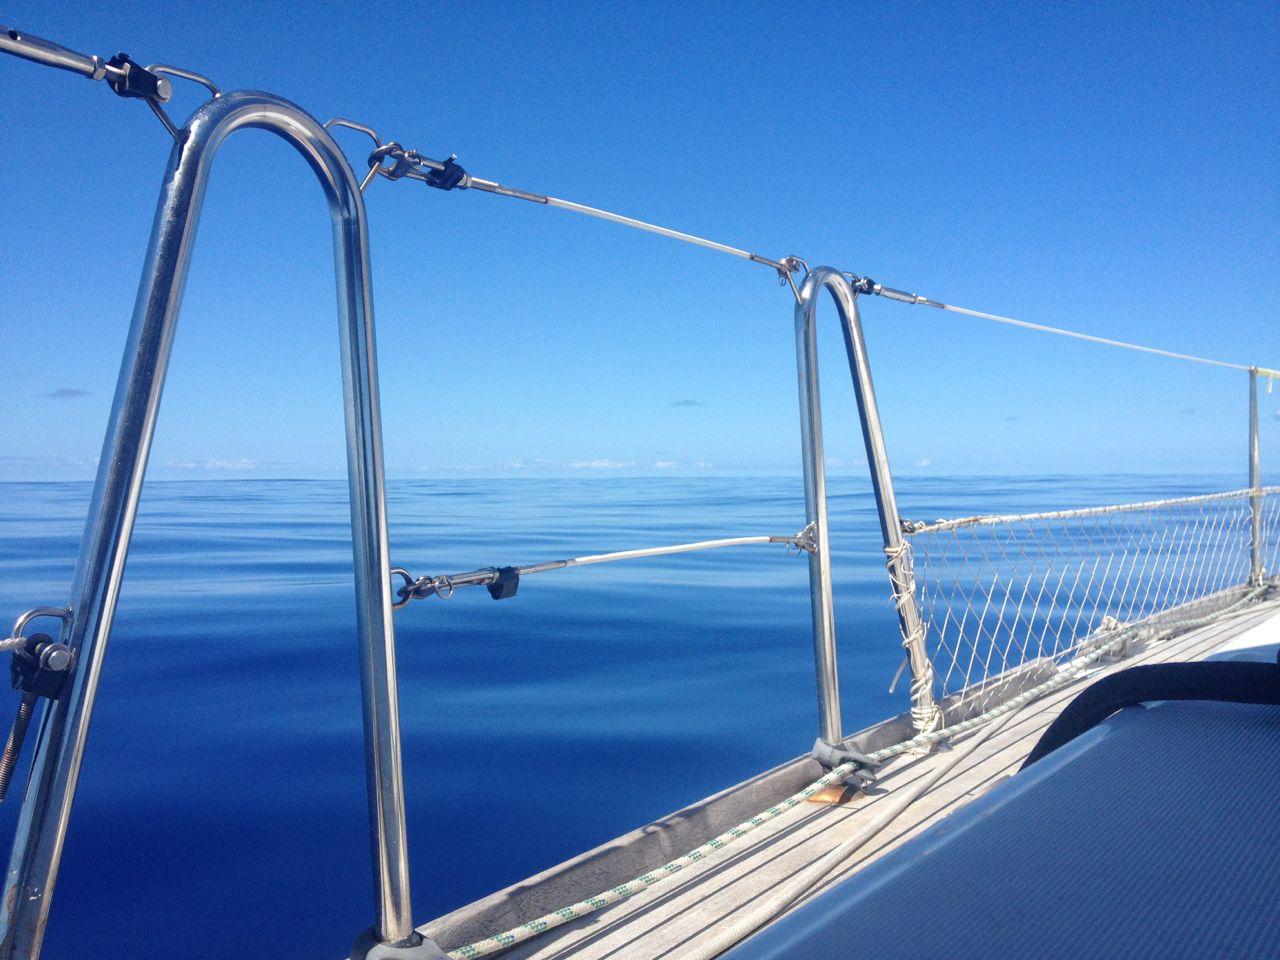 Absolute Flaute auf dem Weg nach Tonga mit der hapa na sasa